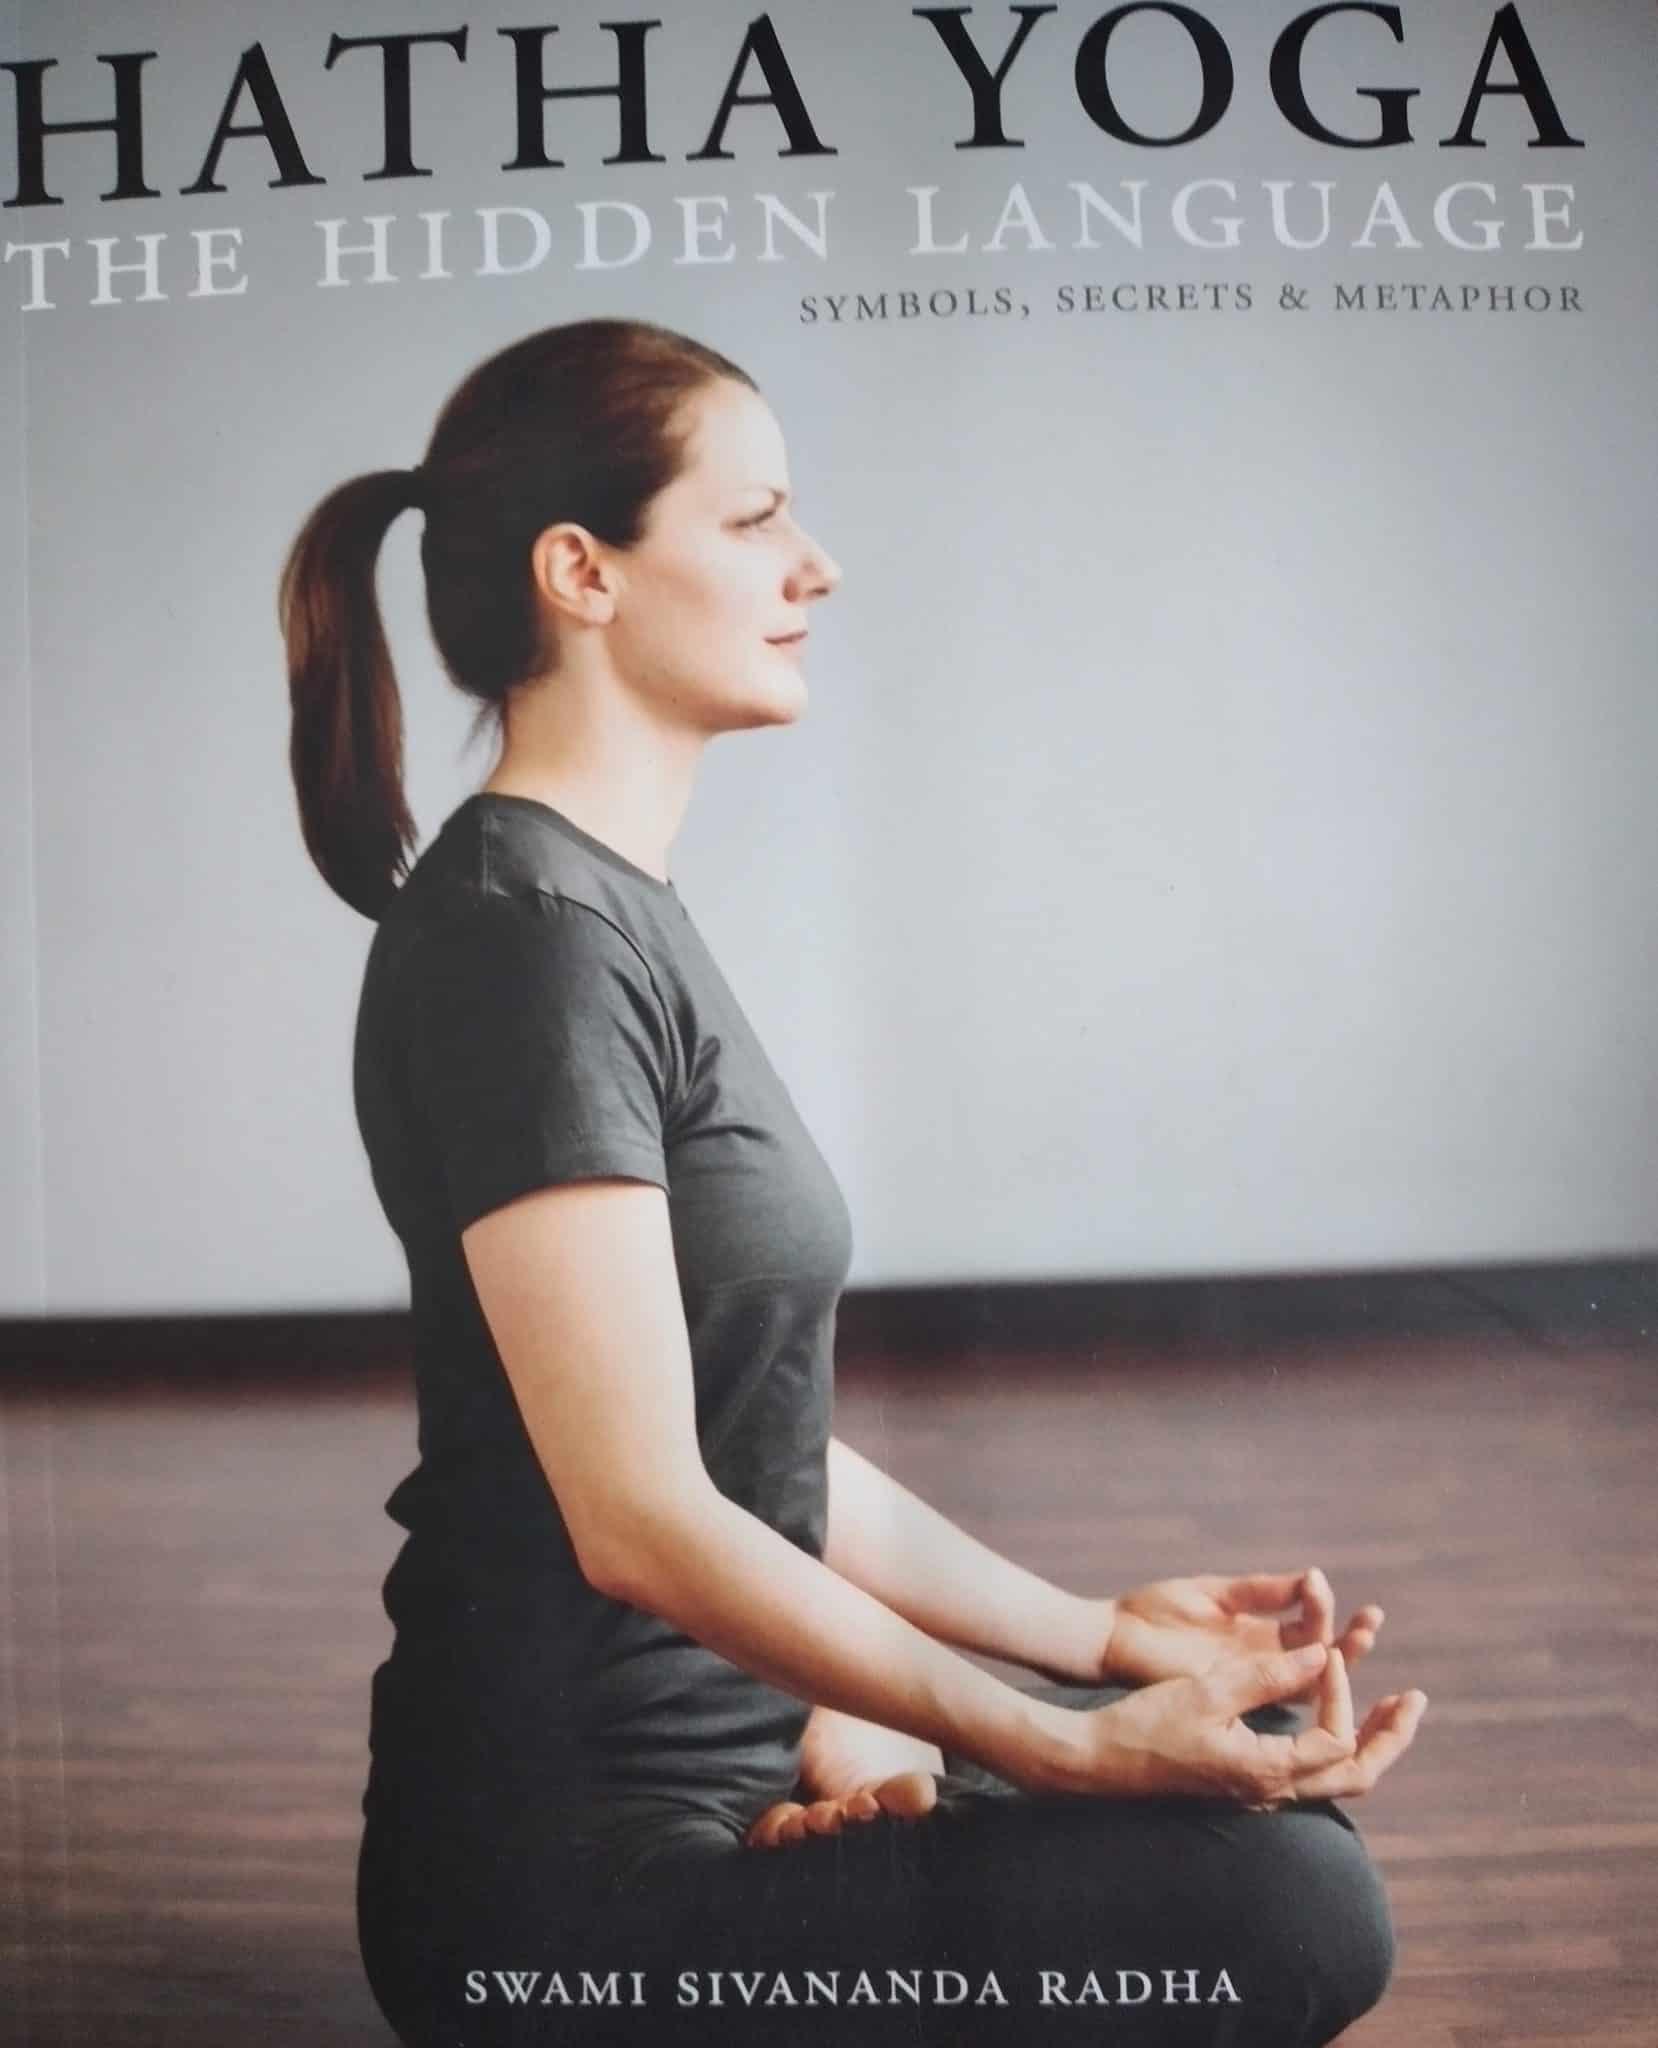 Hatha Yoga. The Hidden Language: Symbols, Secrets & Metaphor